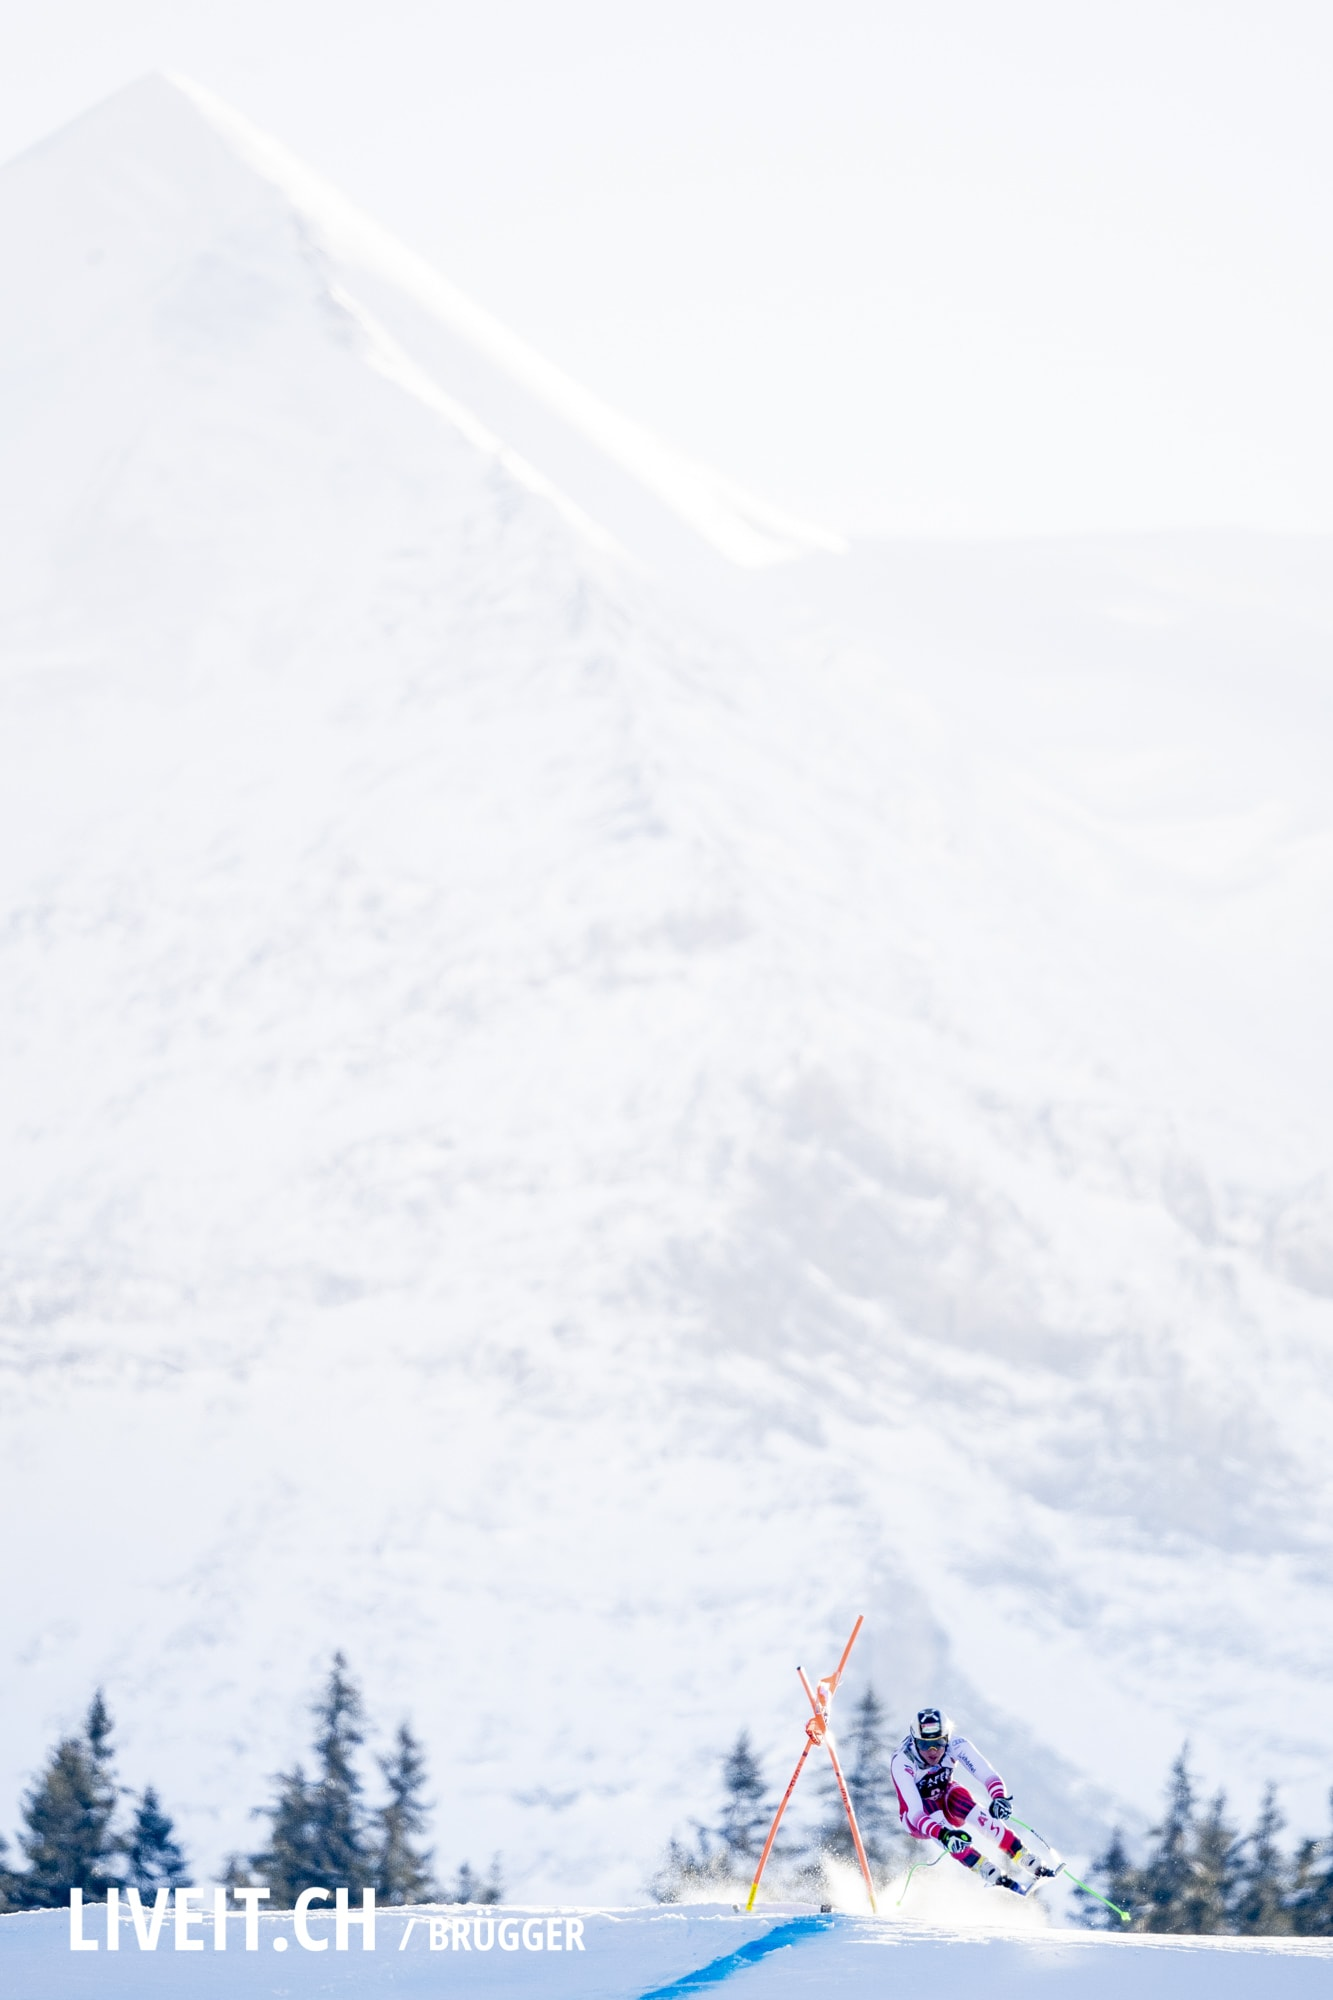 Hannes Reichelt (AUT) fotografiert am Samstag, 19. Januar 2019 am Lauberhornrennen in der Disziplin: Abfahrt. (Fotografiert von Dominic Bruegger liveit.ch)